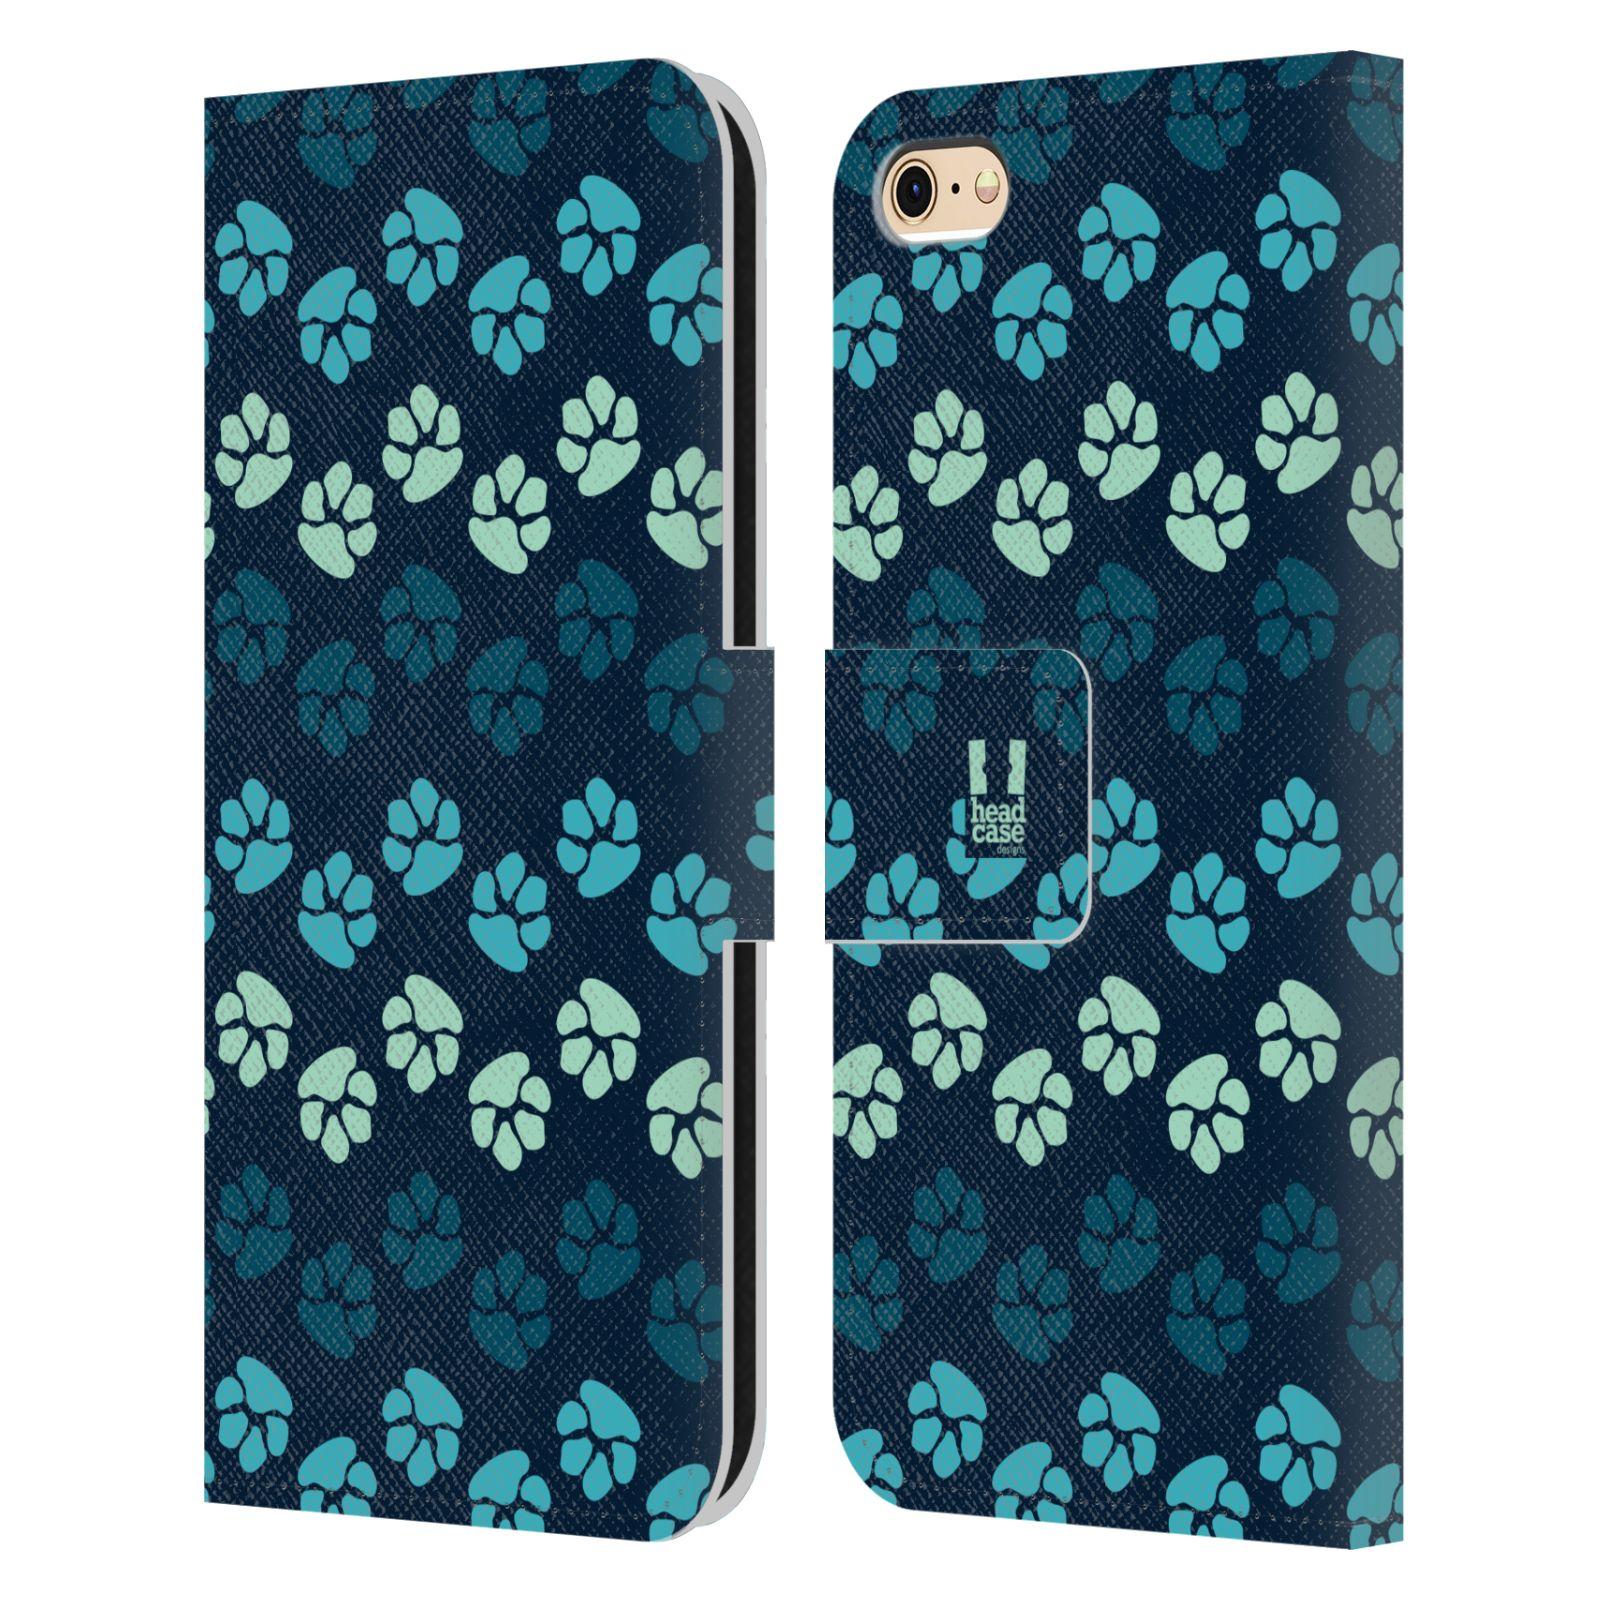 HEAD CASE Flipové pouzdro pro mobil Apple Iphone 6/6s Pejsek ťapky modrá barva